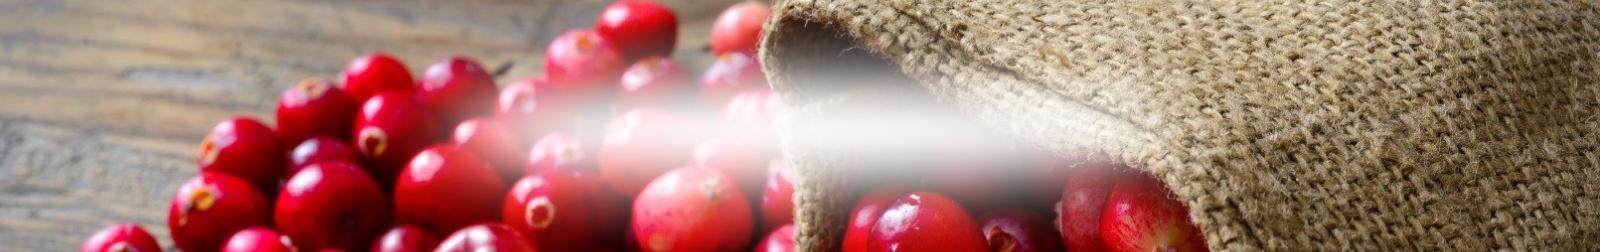 Vitamine si minerale naturale